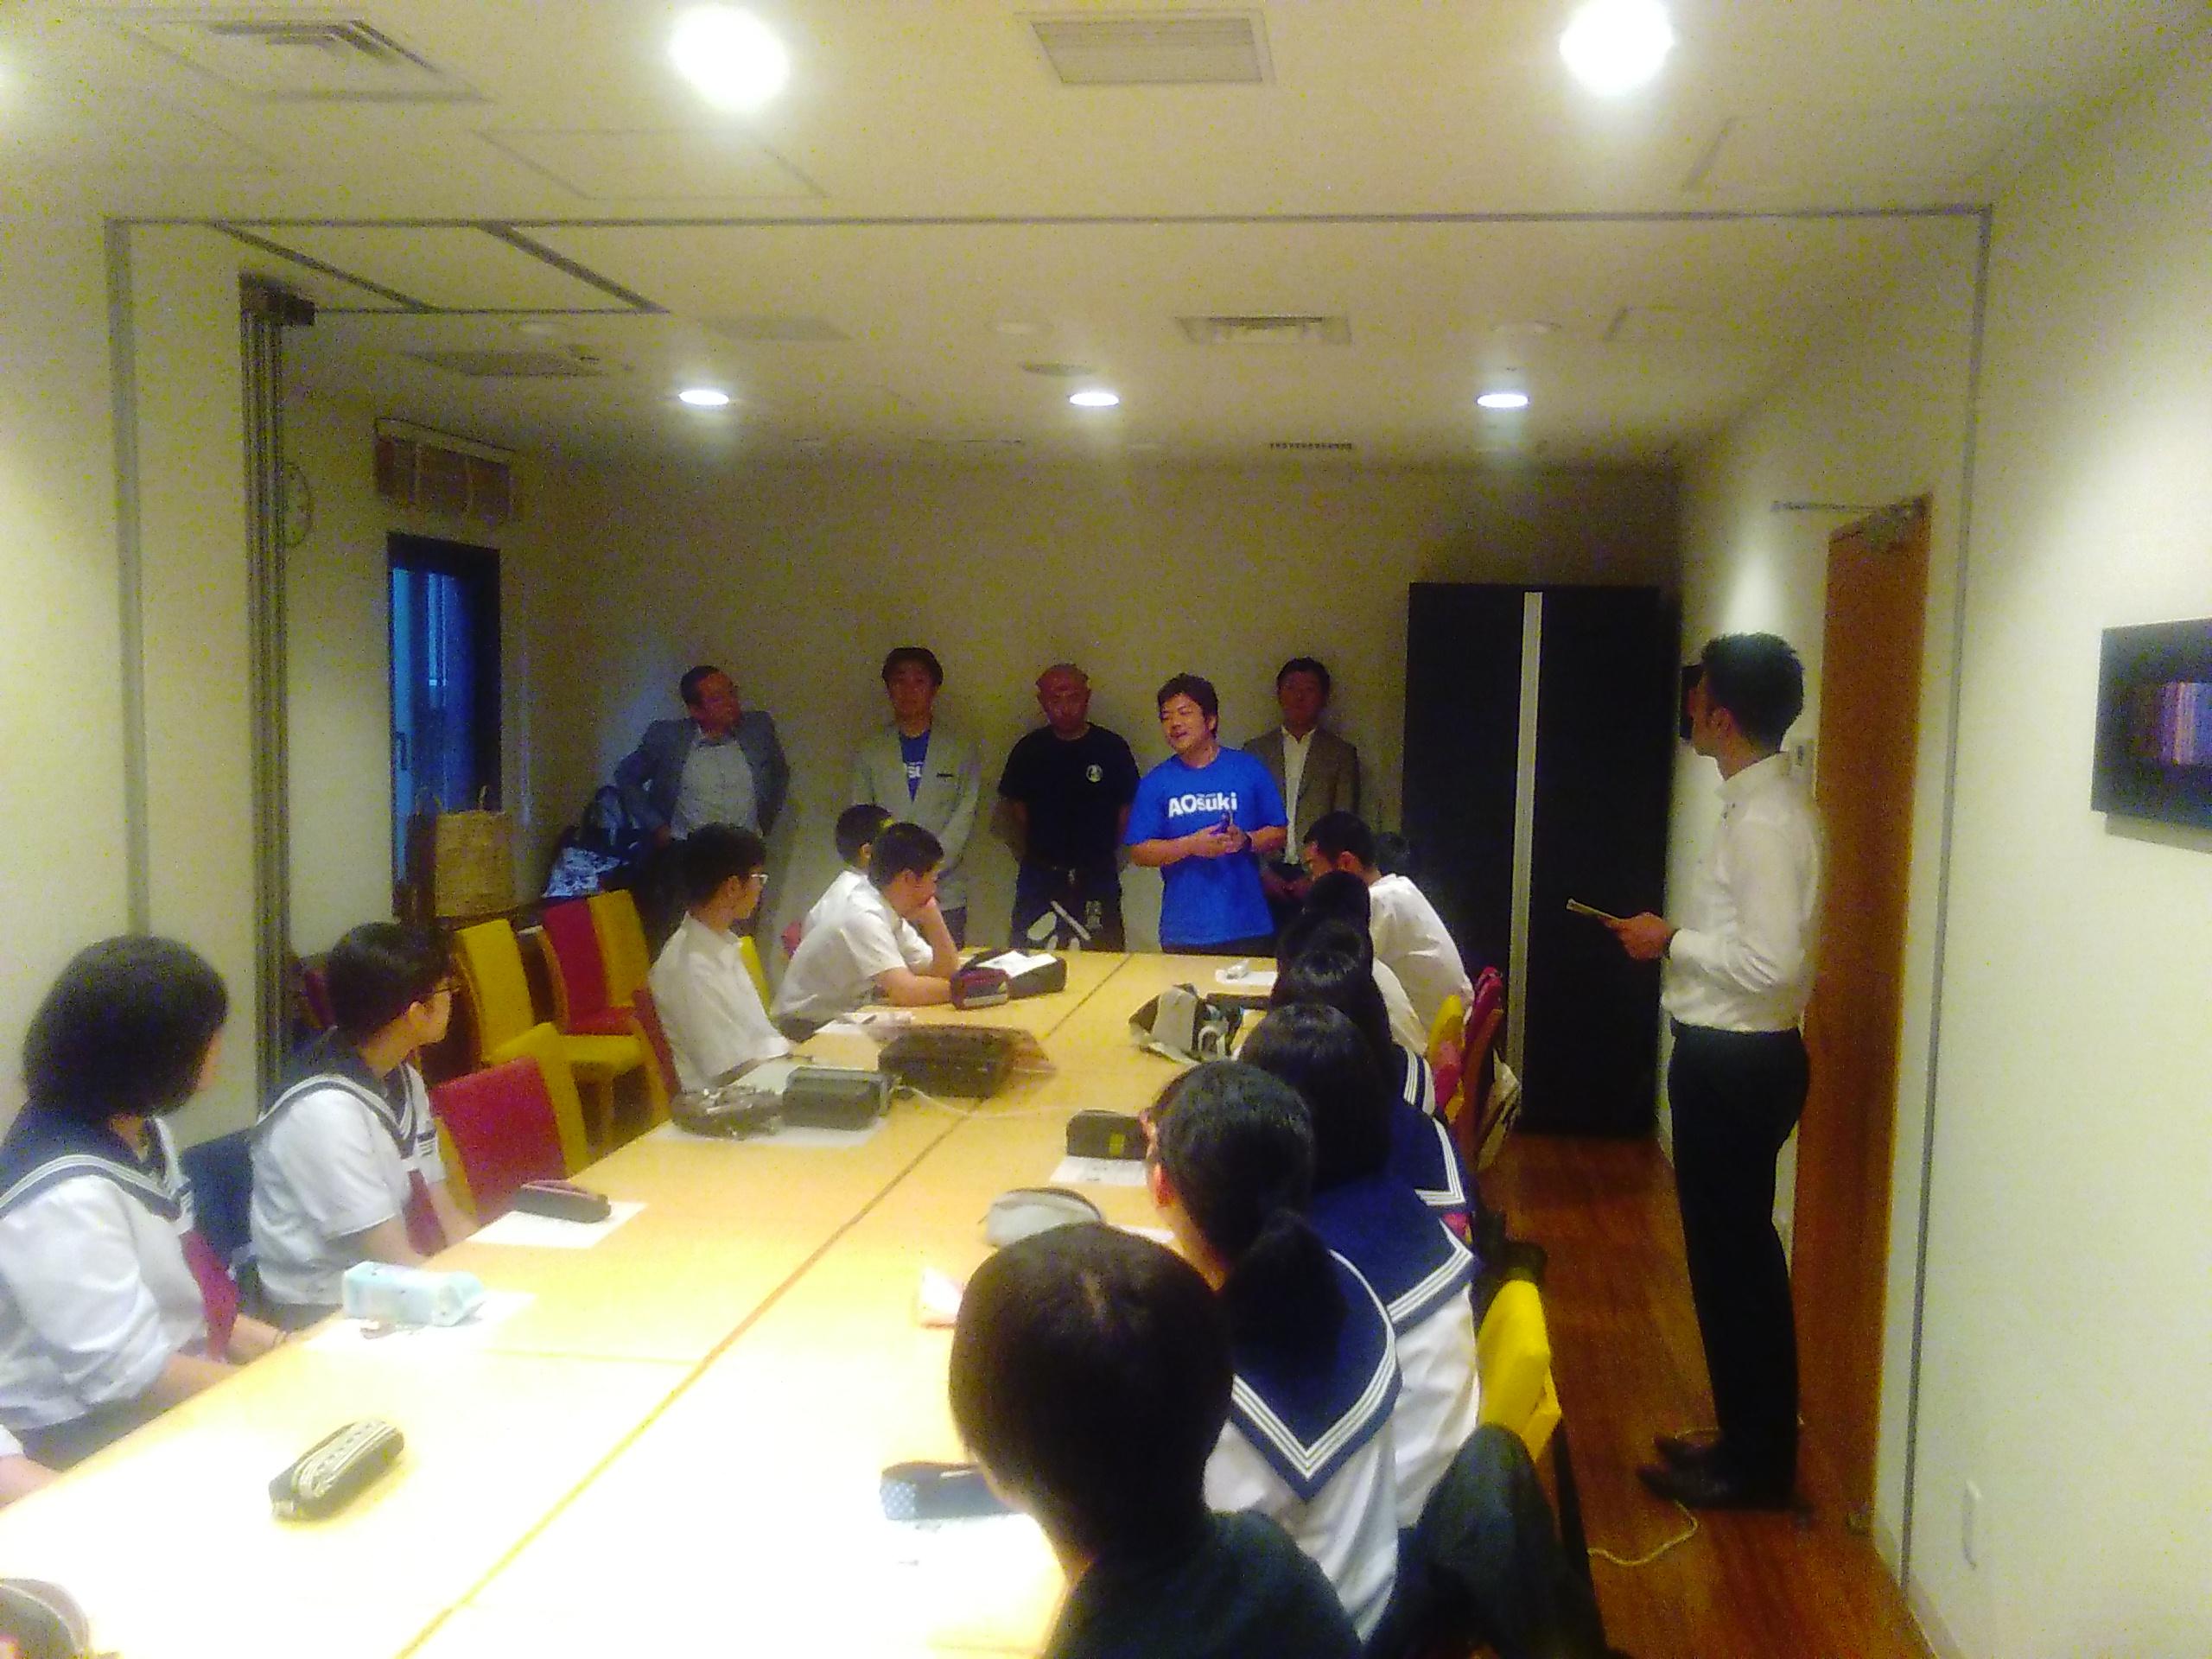 KIMG1209 - AFS【アオスキフューチャーズゼミ】 西平内中学校